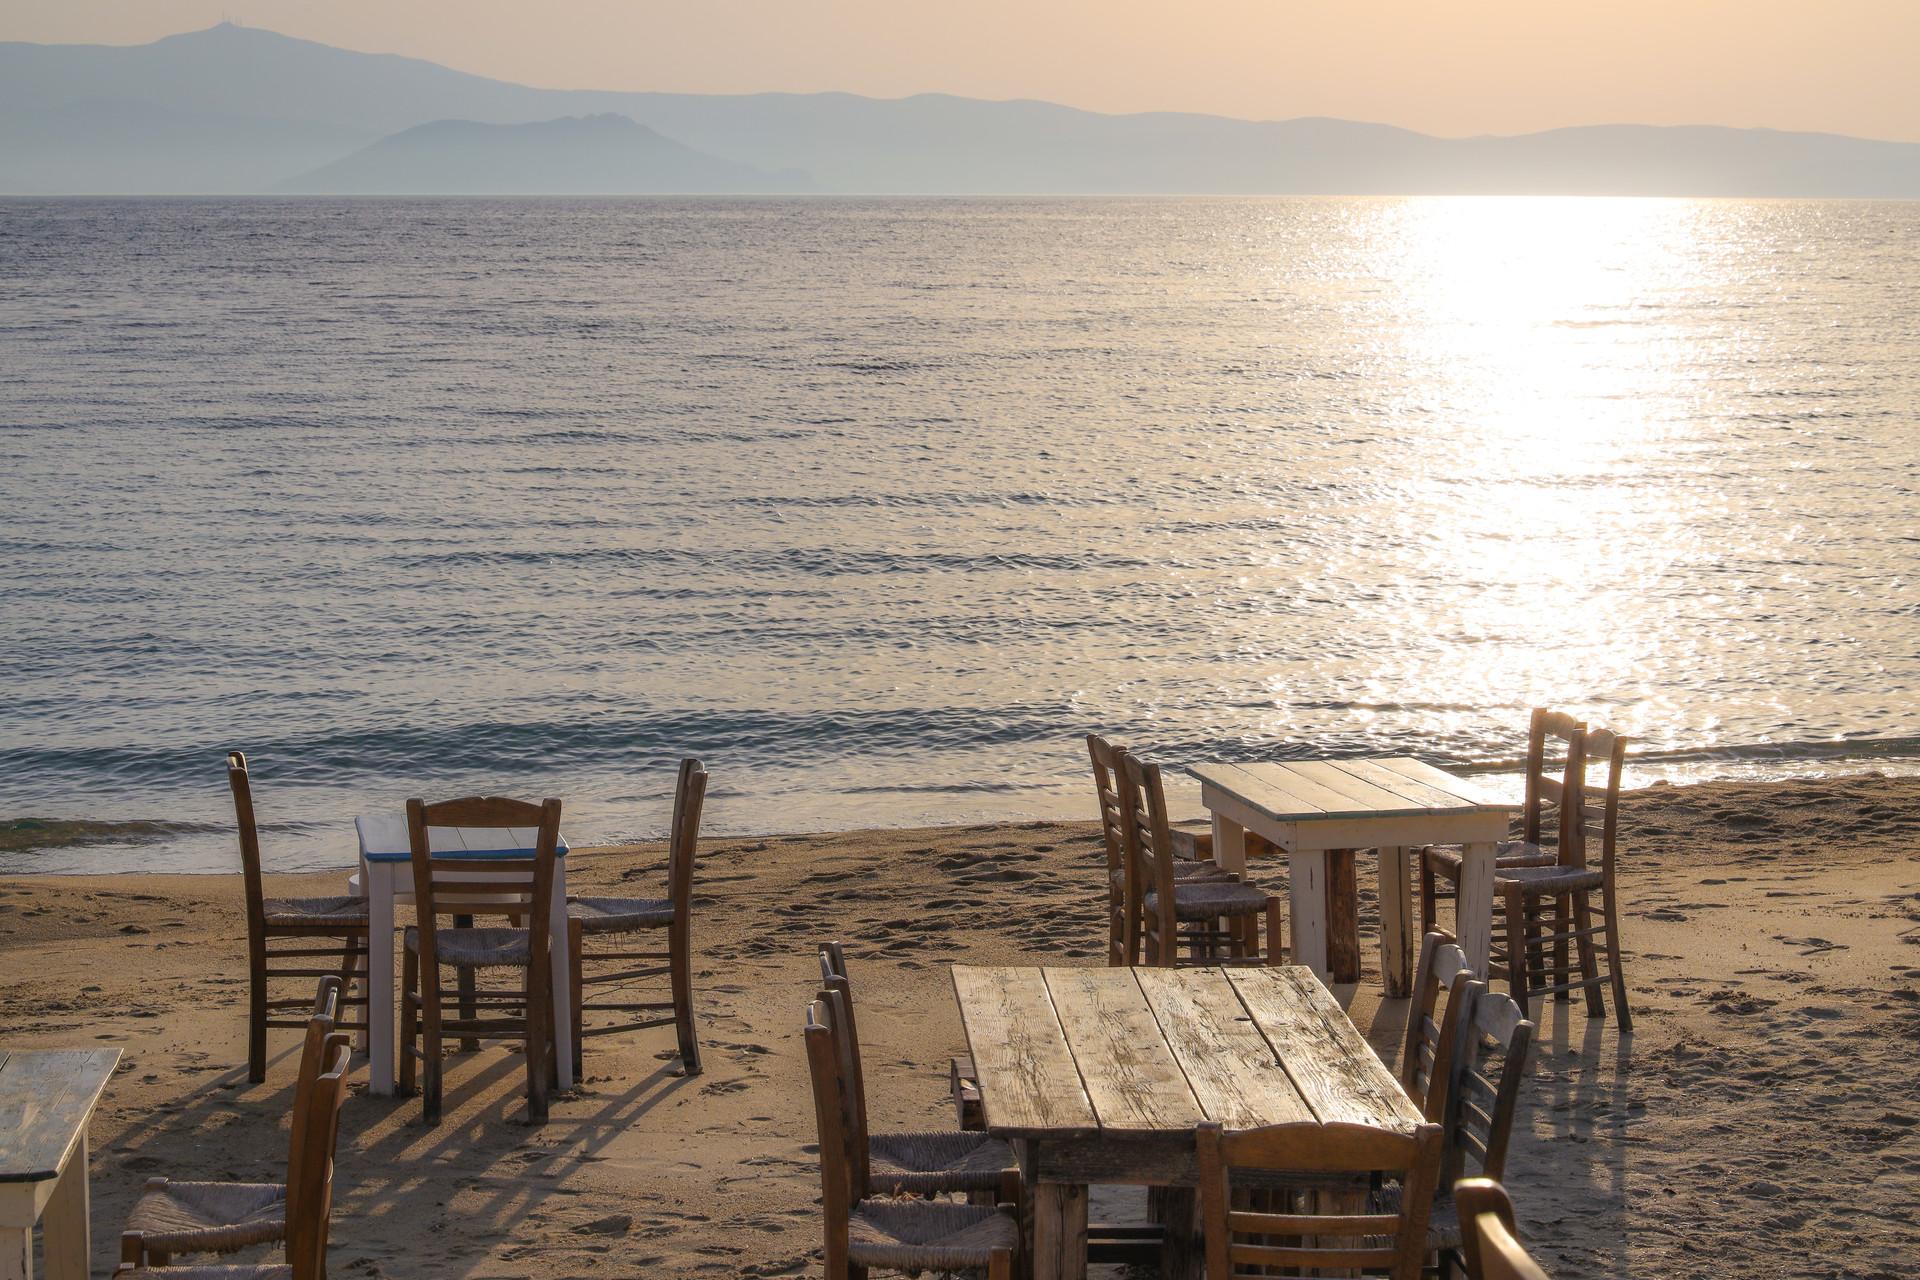 Crépuscule à Plaka beach, Naxos